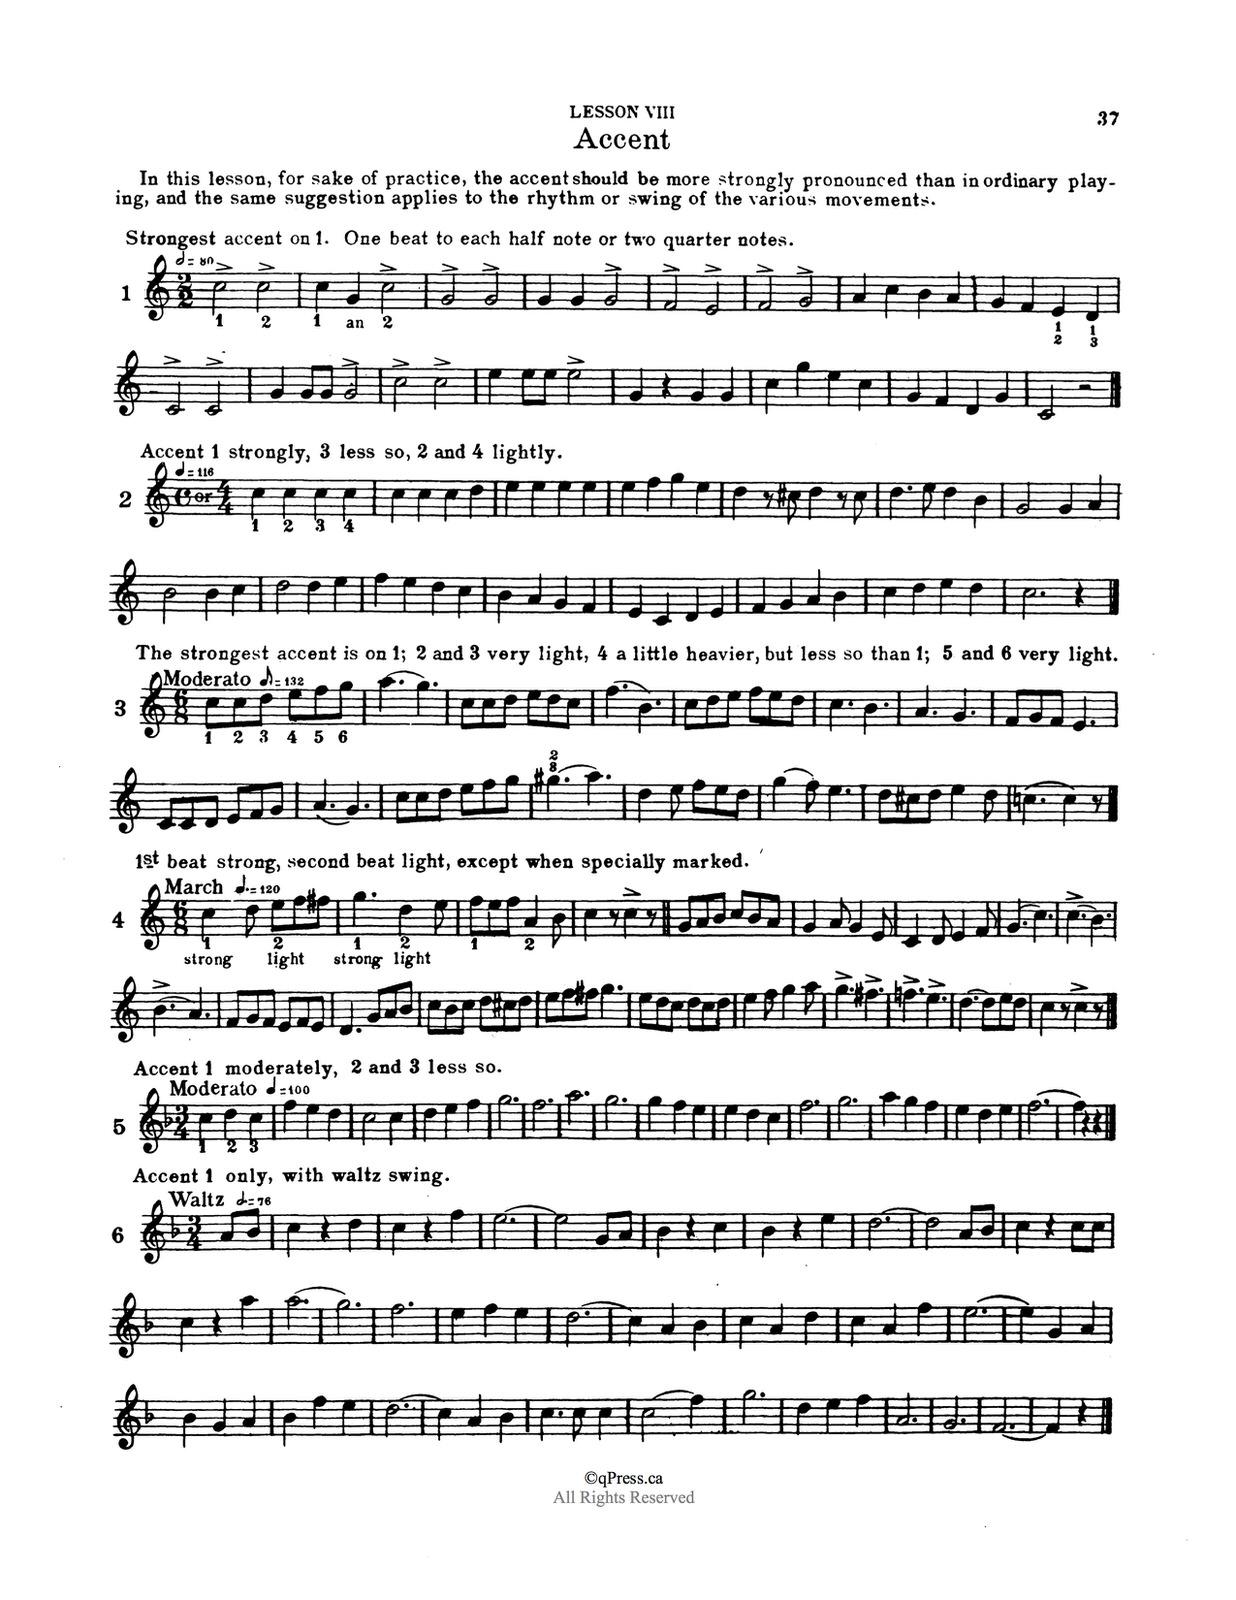 Eby, Walter Scientific Method for Trumpet Volume 2 3